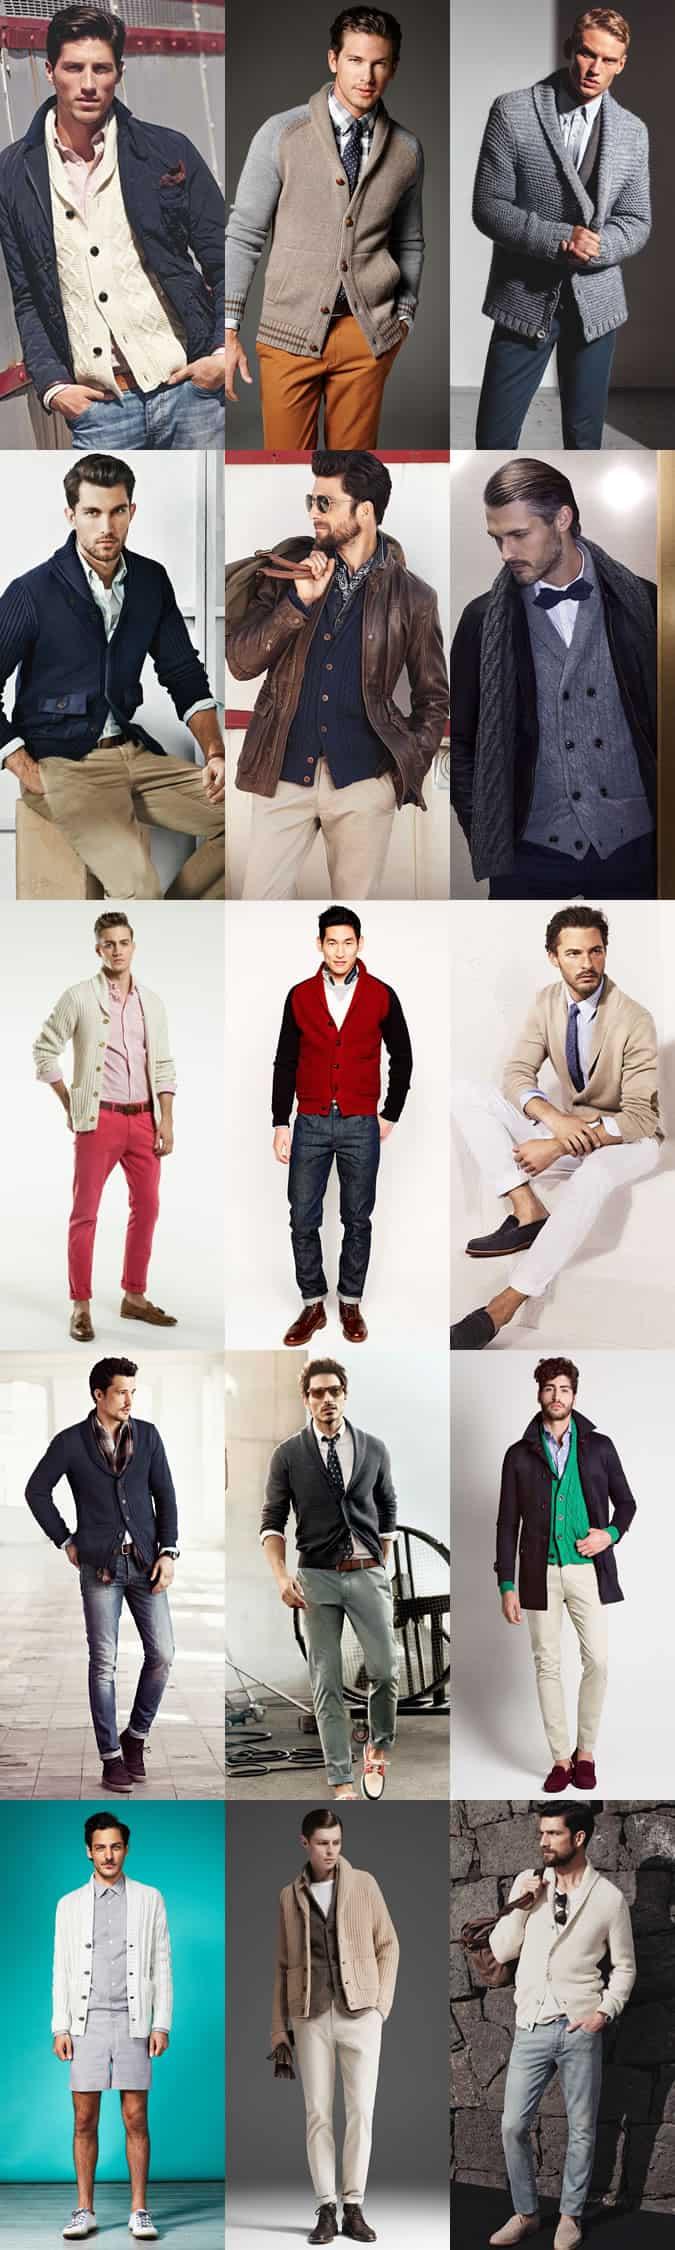 Men's Shawl Neck Cardigan Outfit Inspiration Lookbook